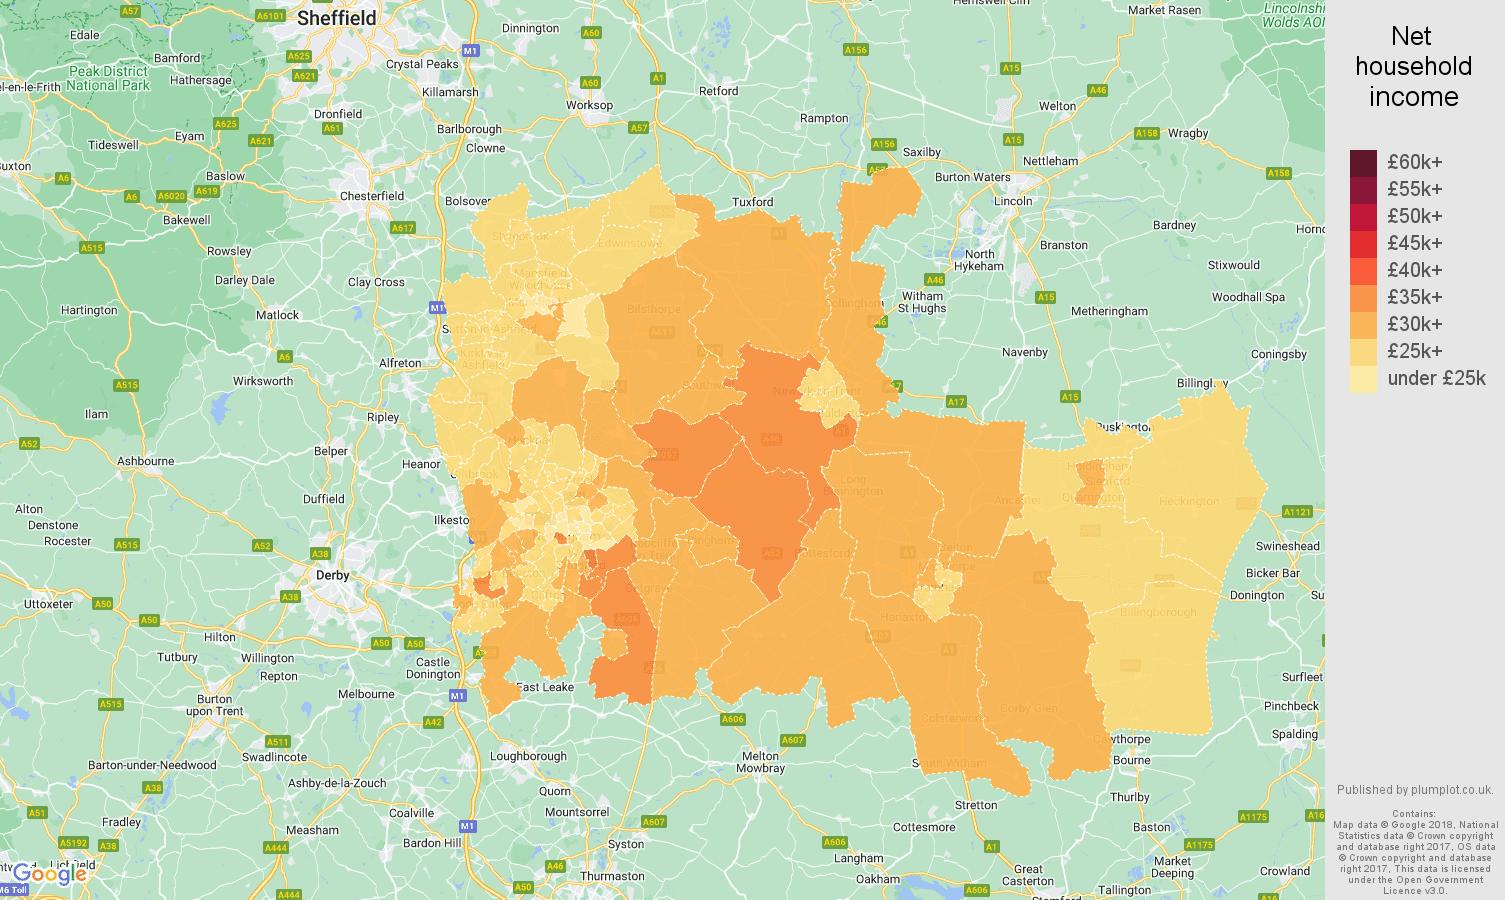 Nottingham net household income map